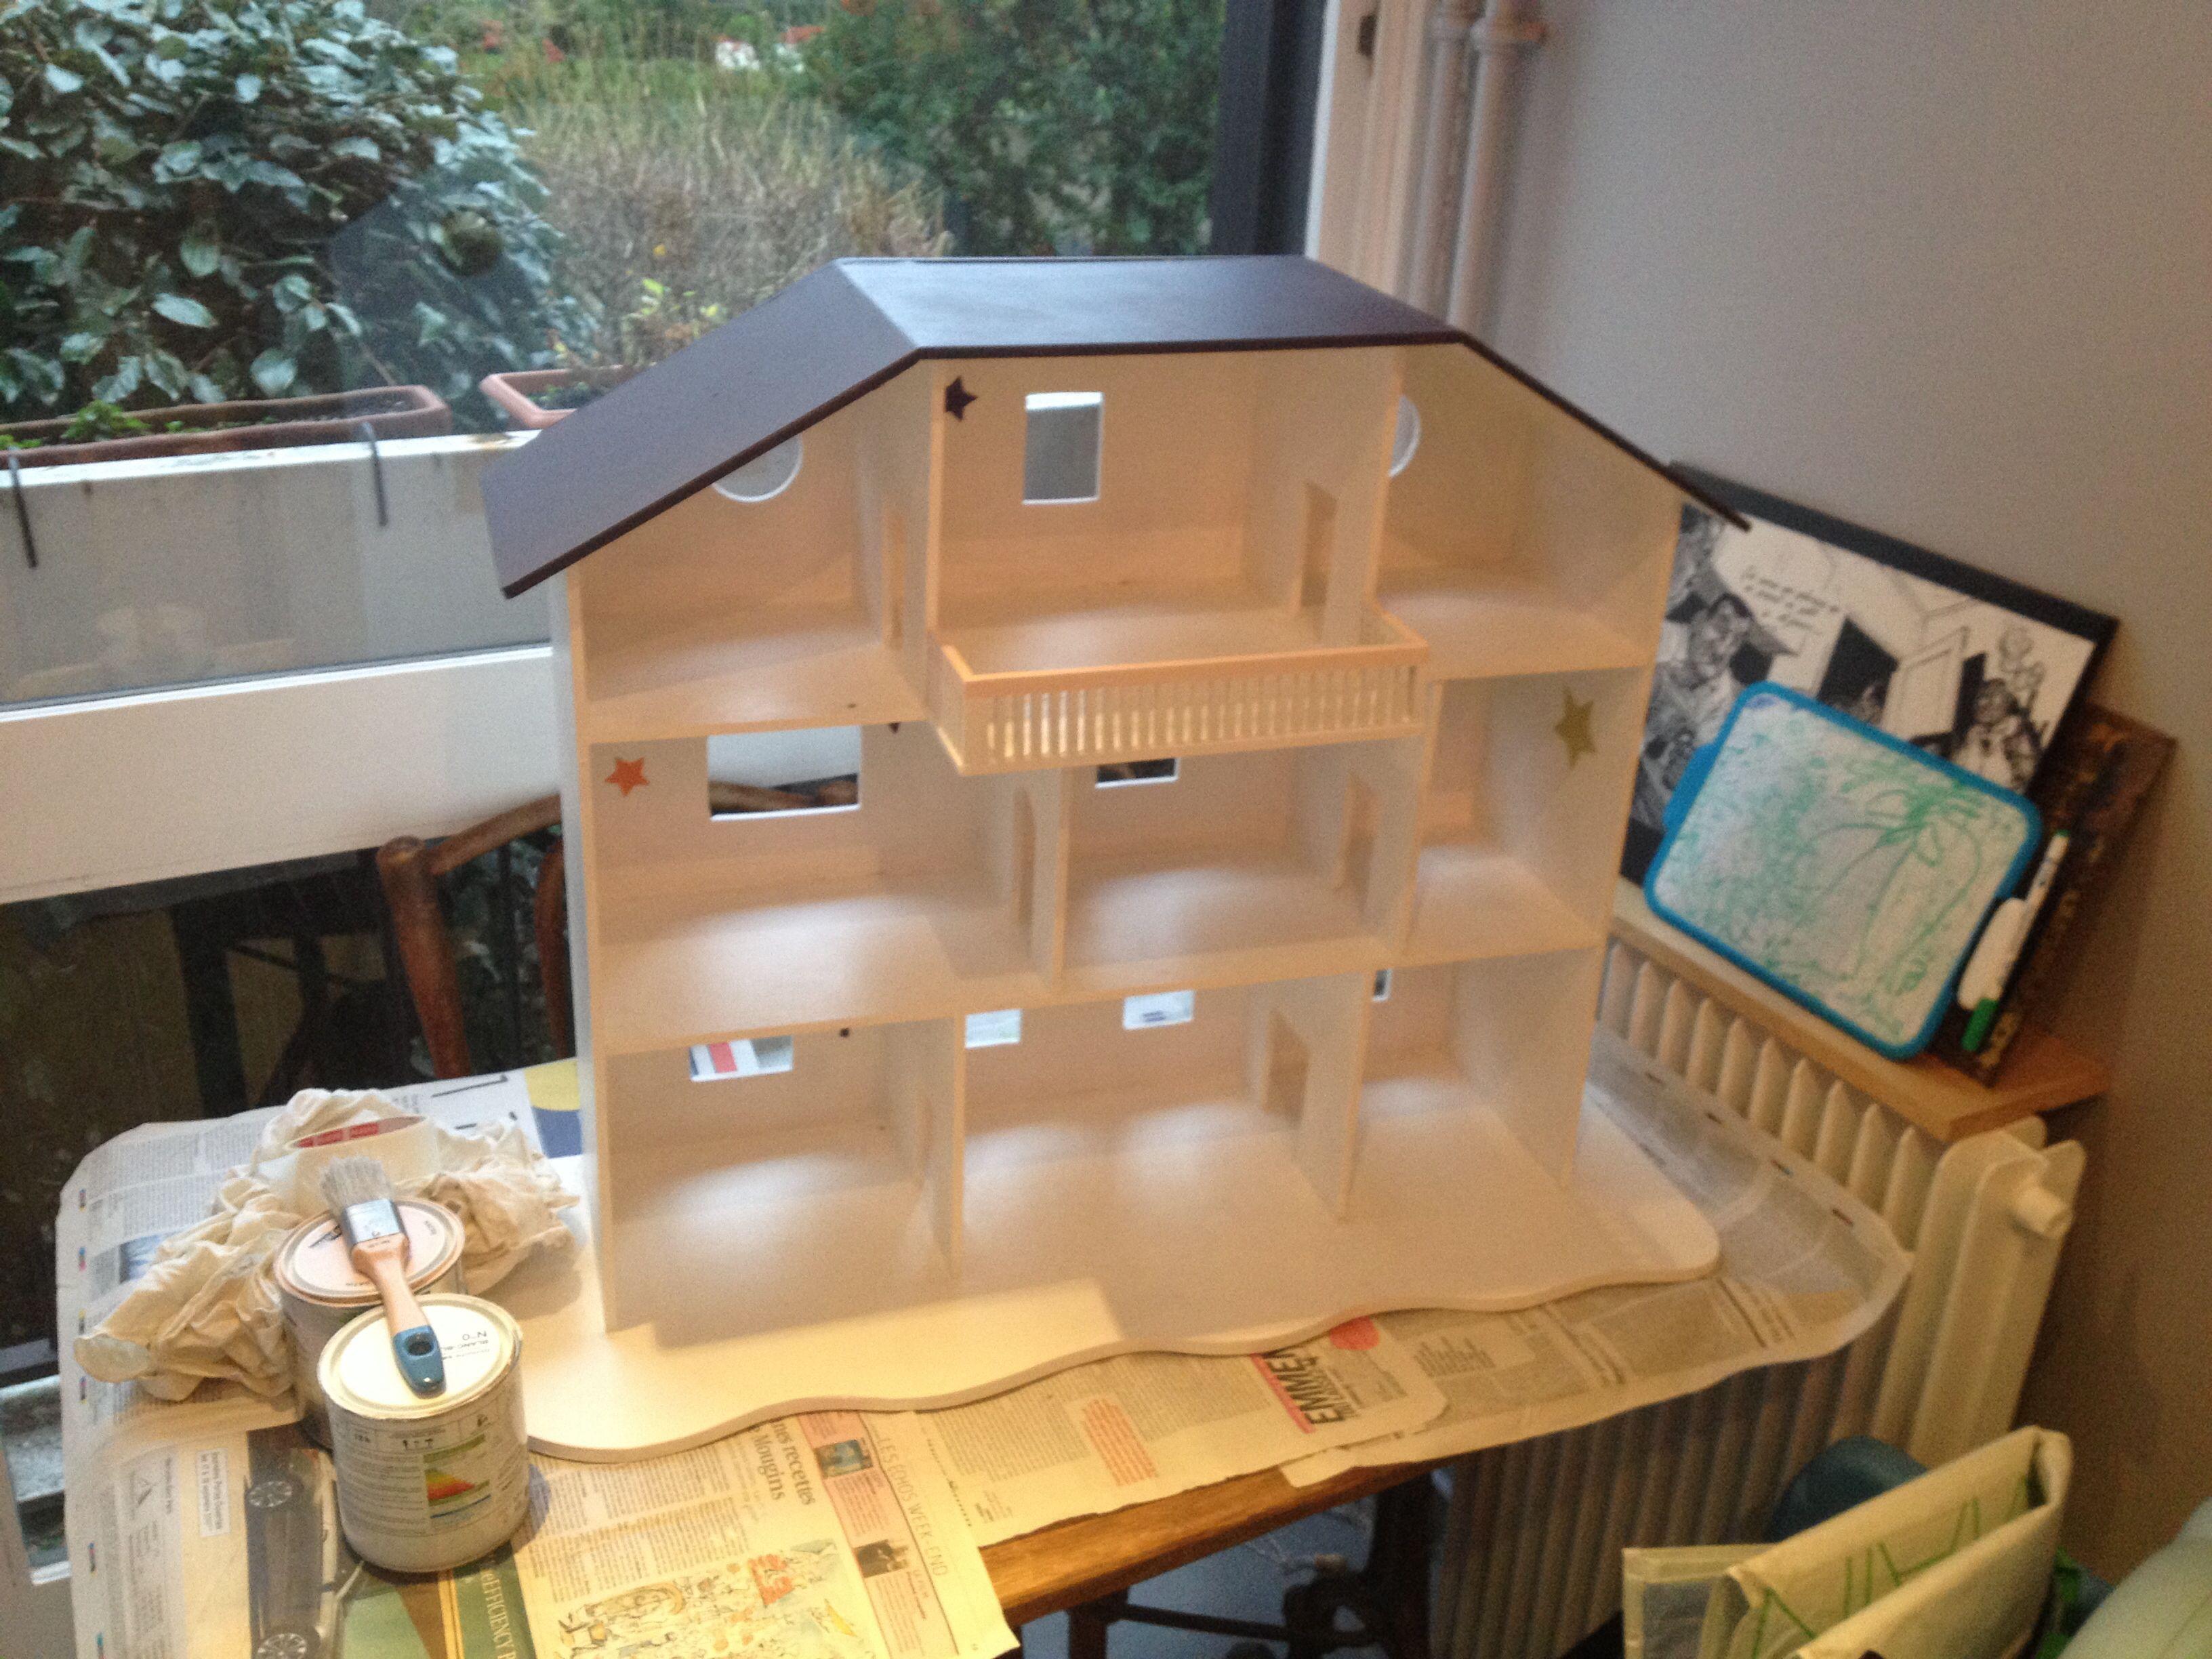 diy maison de playmobil playmobil playmobil barbie house house